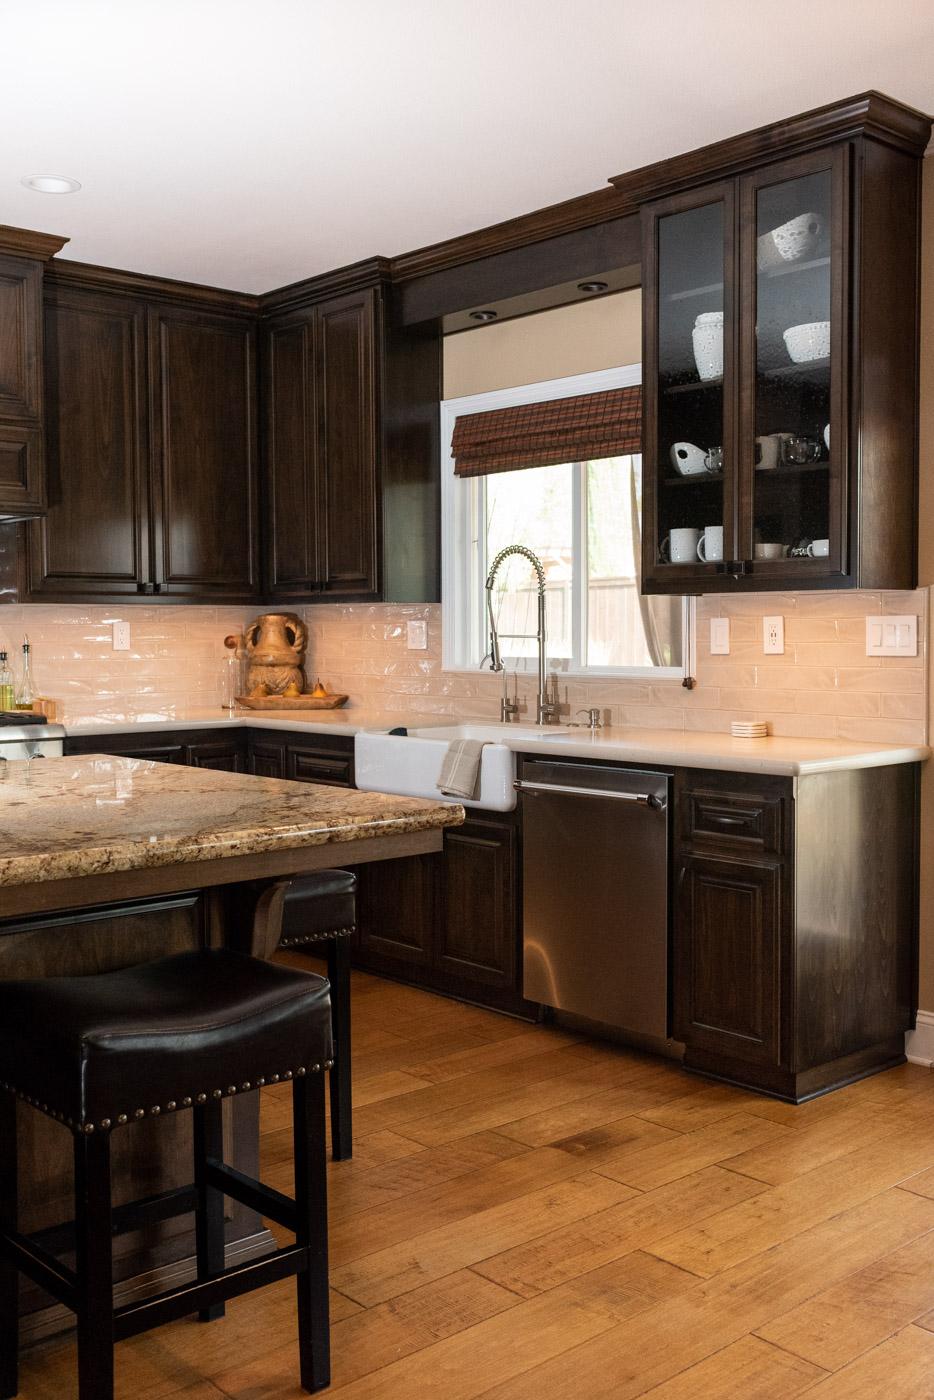 Traditional Mediterranean kitchen with dark wood stain cabinets